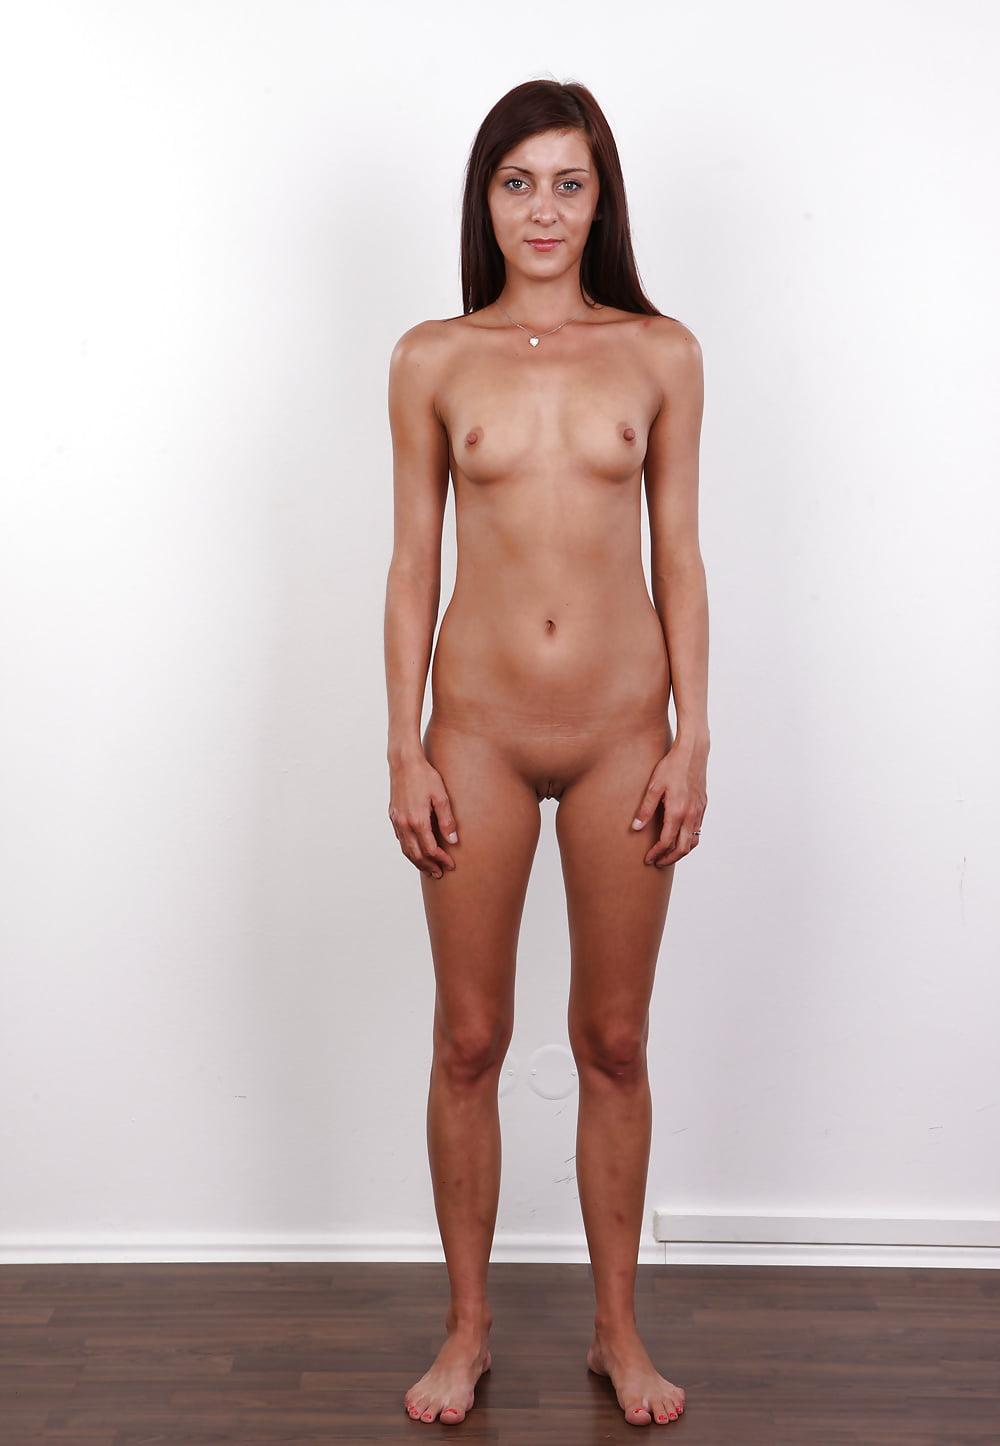 nude-girls-standing-on-head